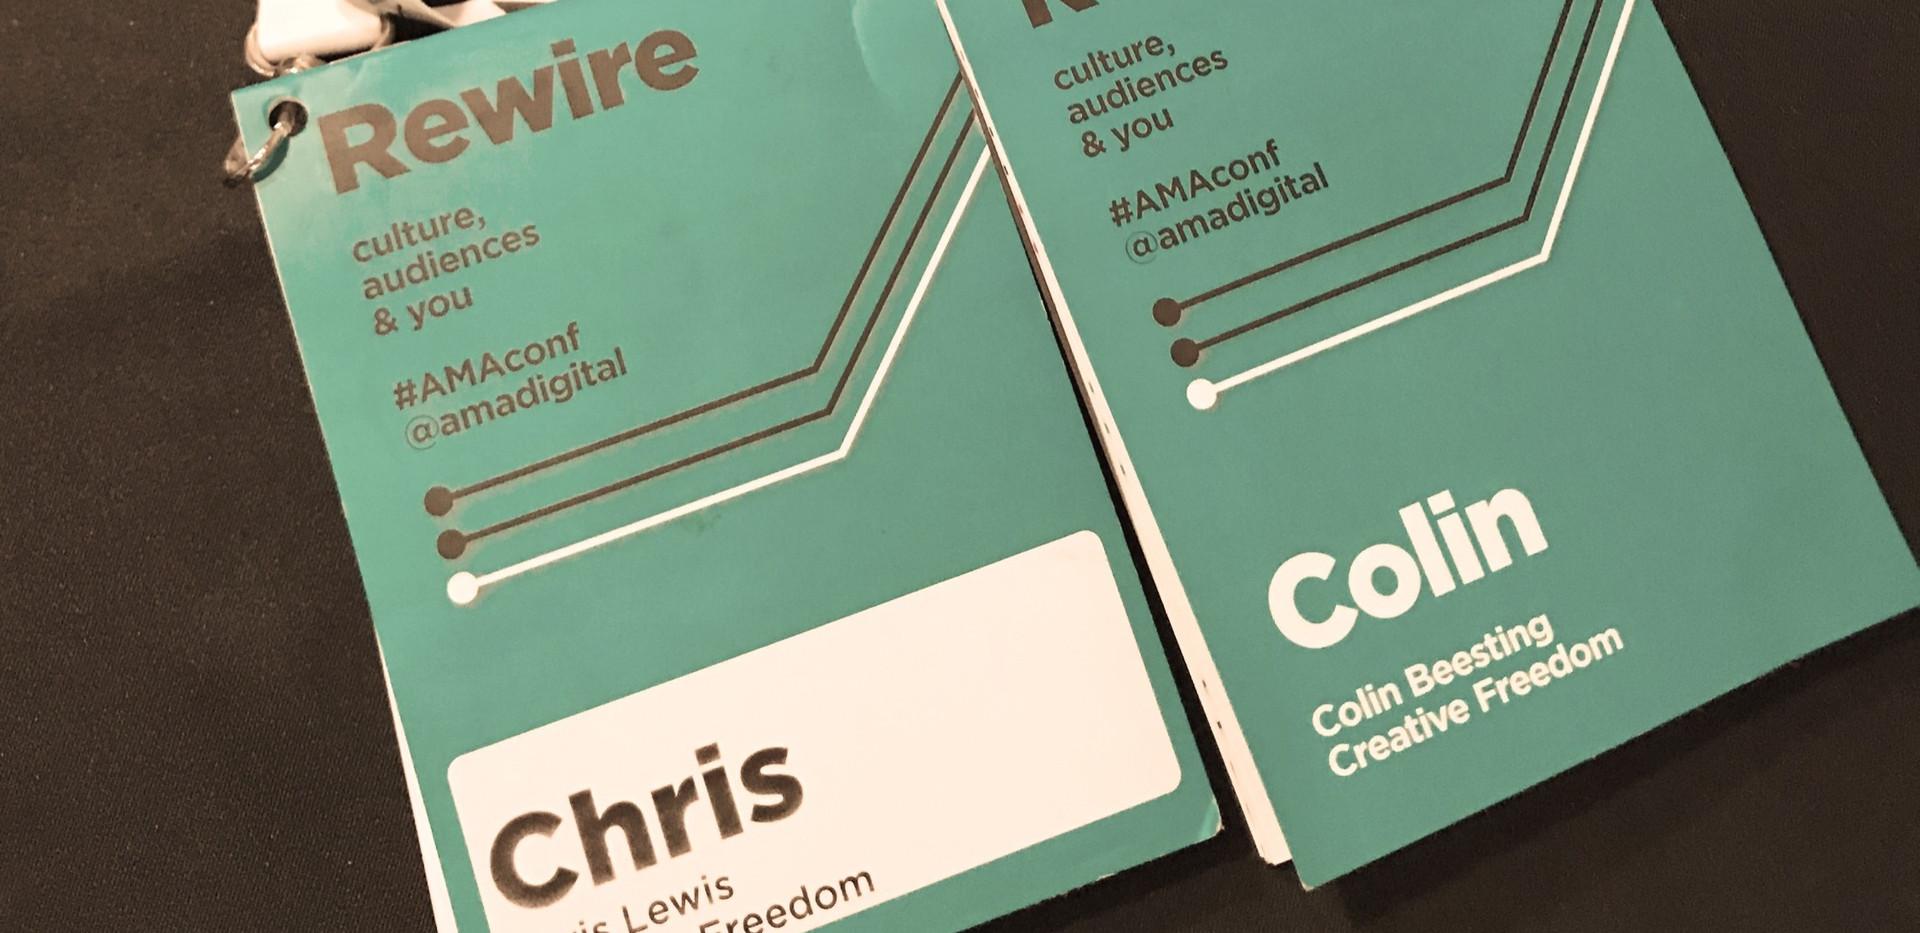 Conference programmes.jpg